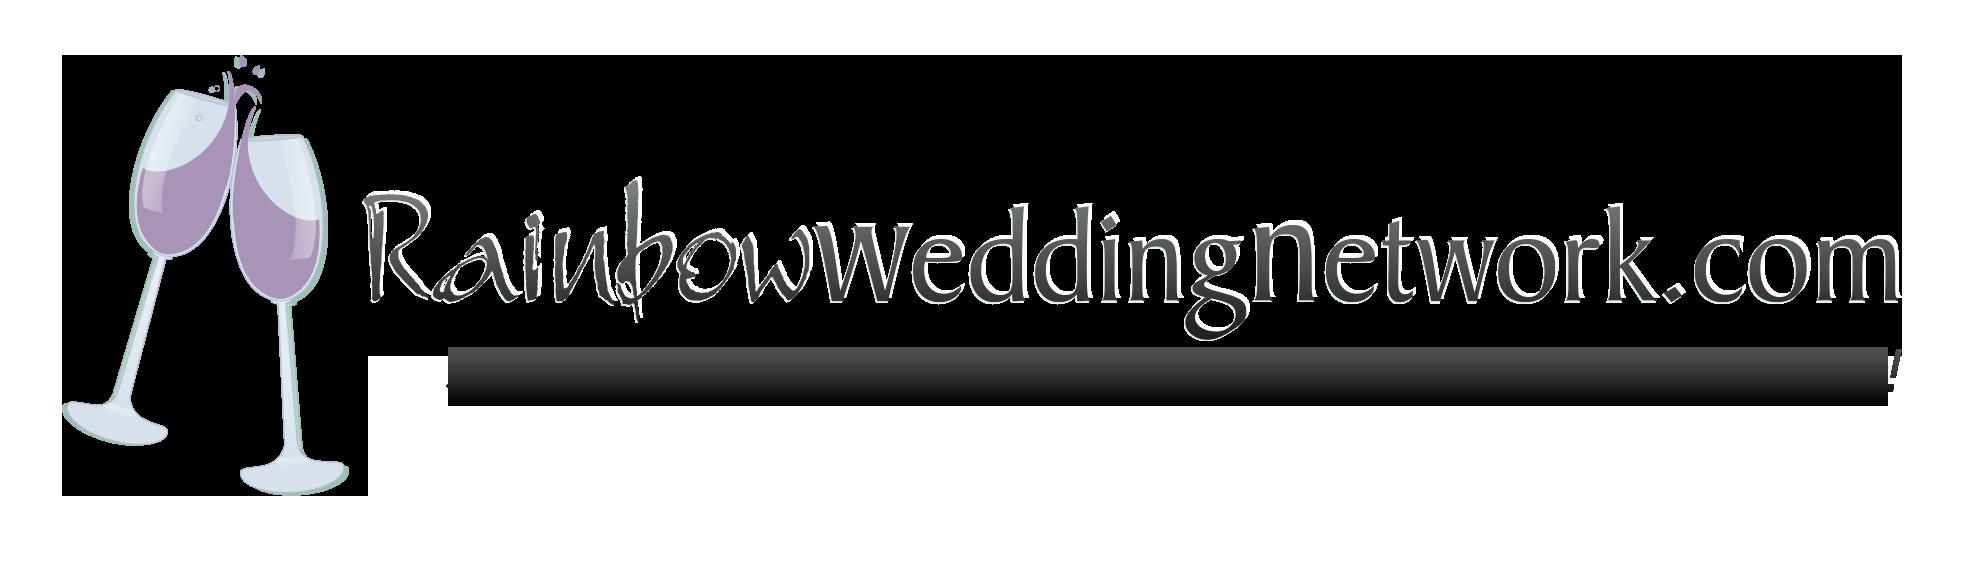 RainbowWeddingNetwork